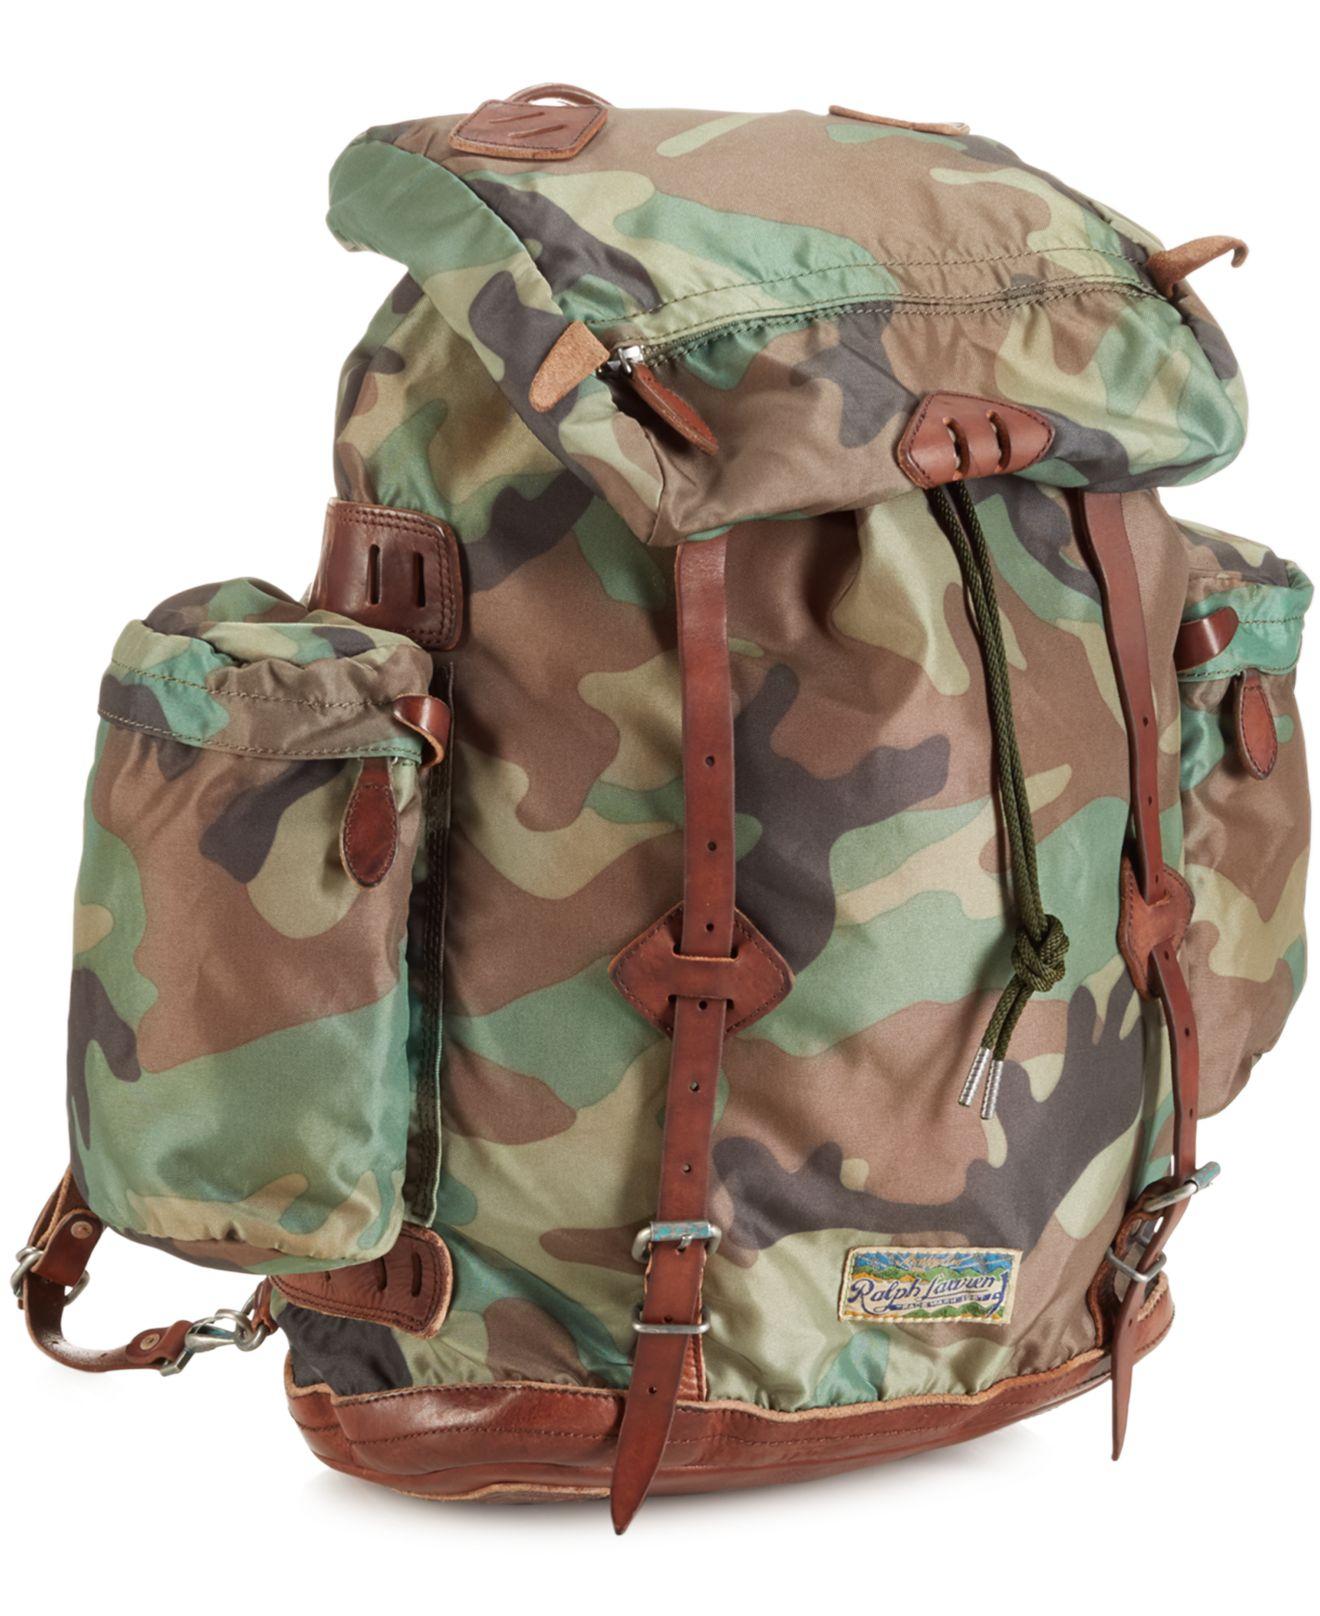 542458c8be31 Lyst - Polo Ralph Lauren Yosemite Nylon Camo Backpack in Green for Men